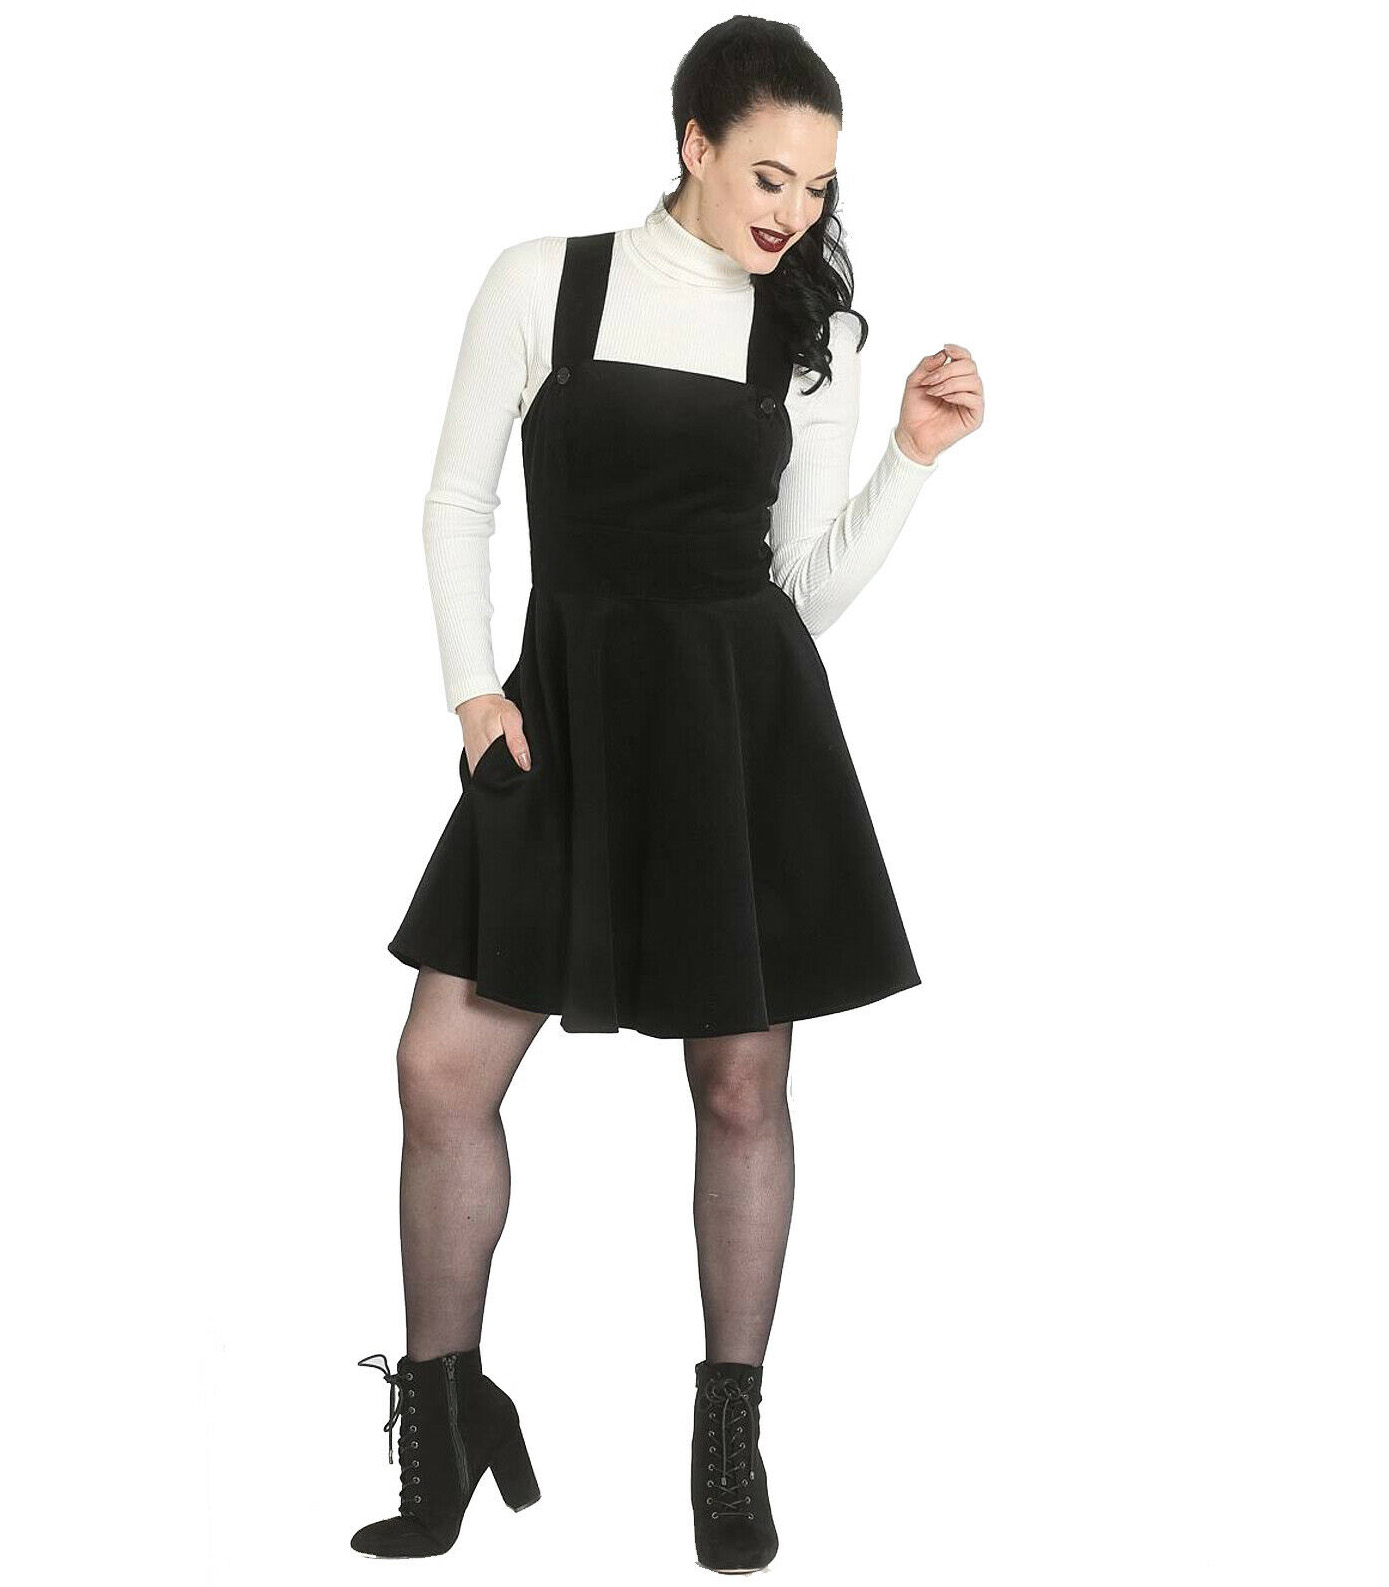 Hell-Bunny-Rockabilly-Corduroy-Mini-Dress-WONDER-YEARS-Pinafore-Black-All-Sizes thumbnail 23